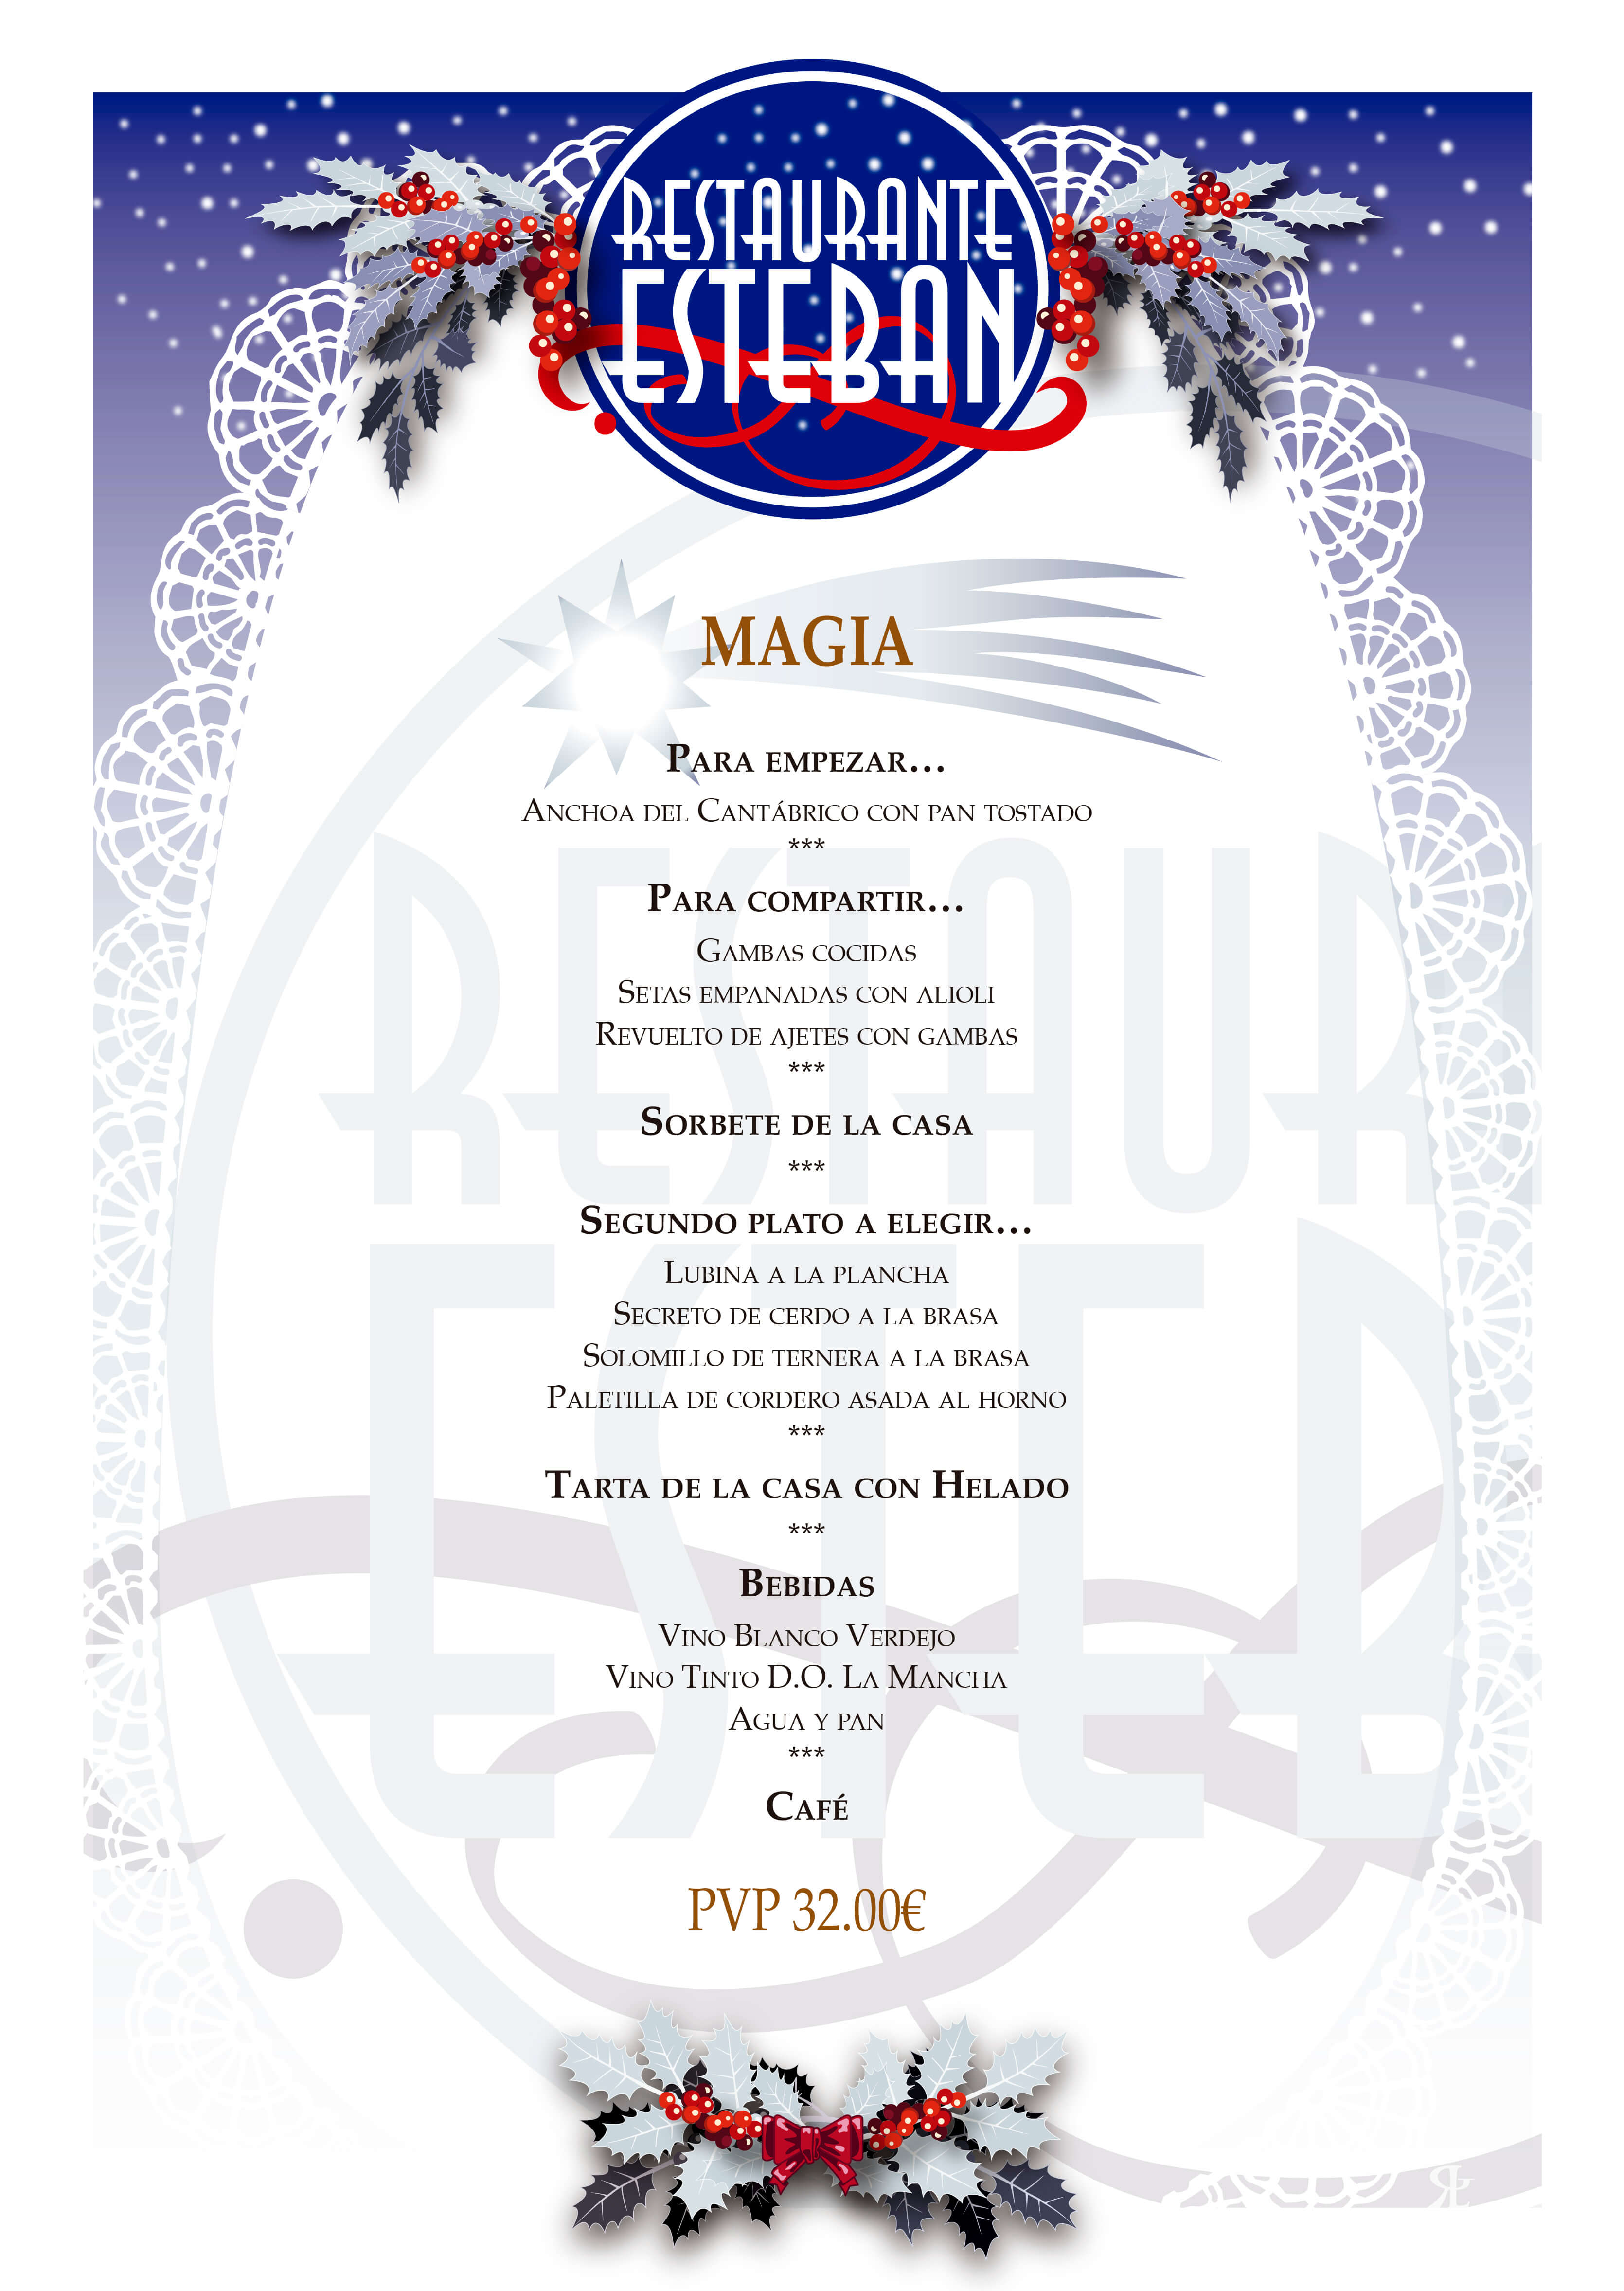 navidad-3-2016-magia111-1